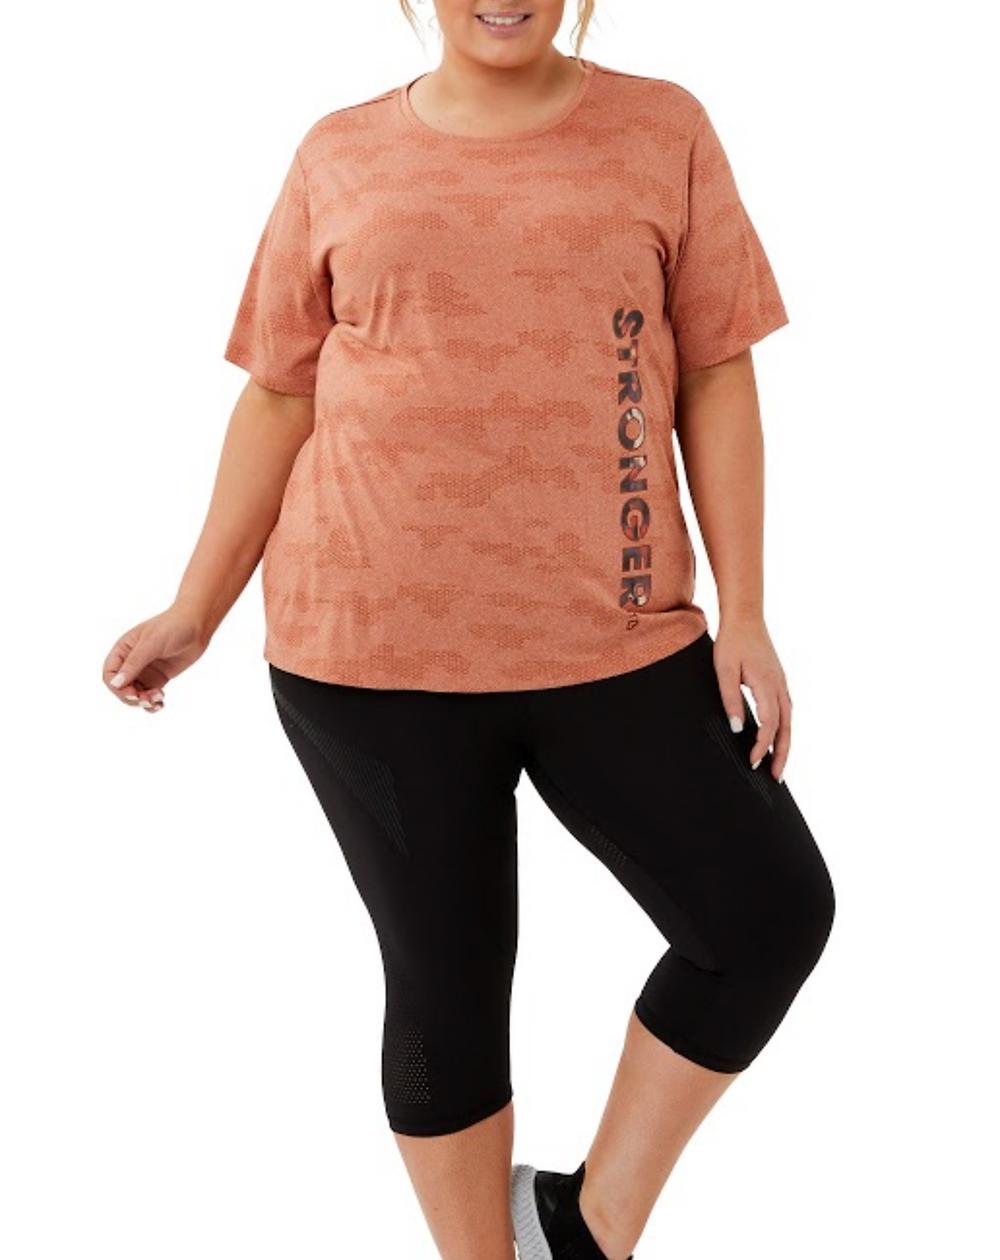 Big W Michelle Bridges activewear